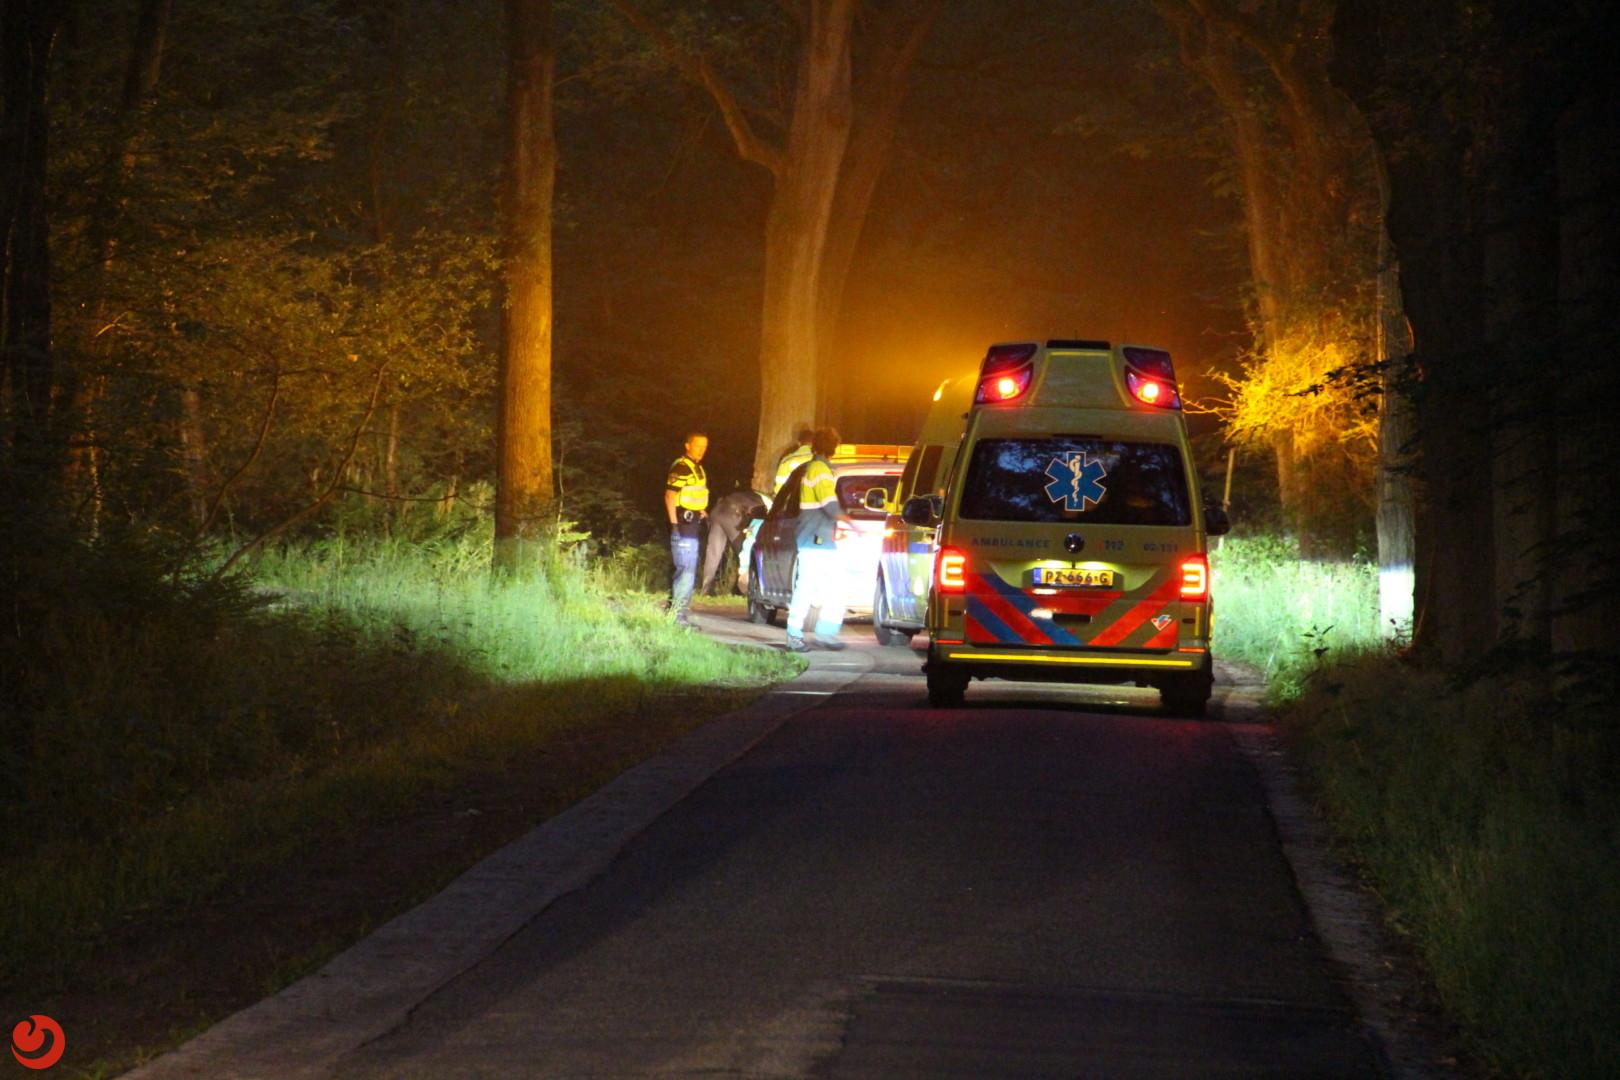 Motorrijder ernstig gewond na politieachtervolging